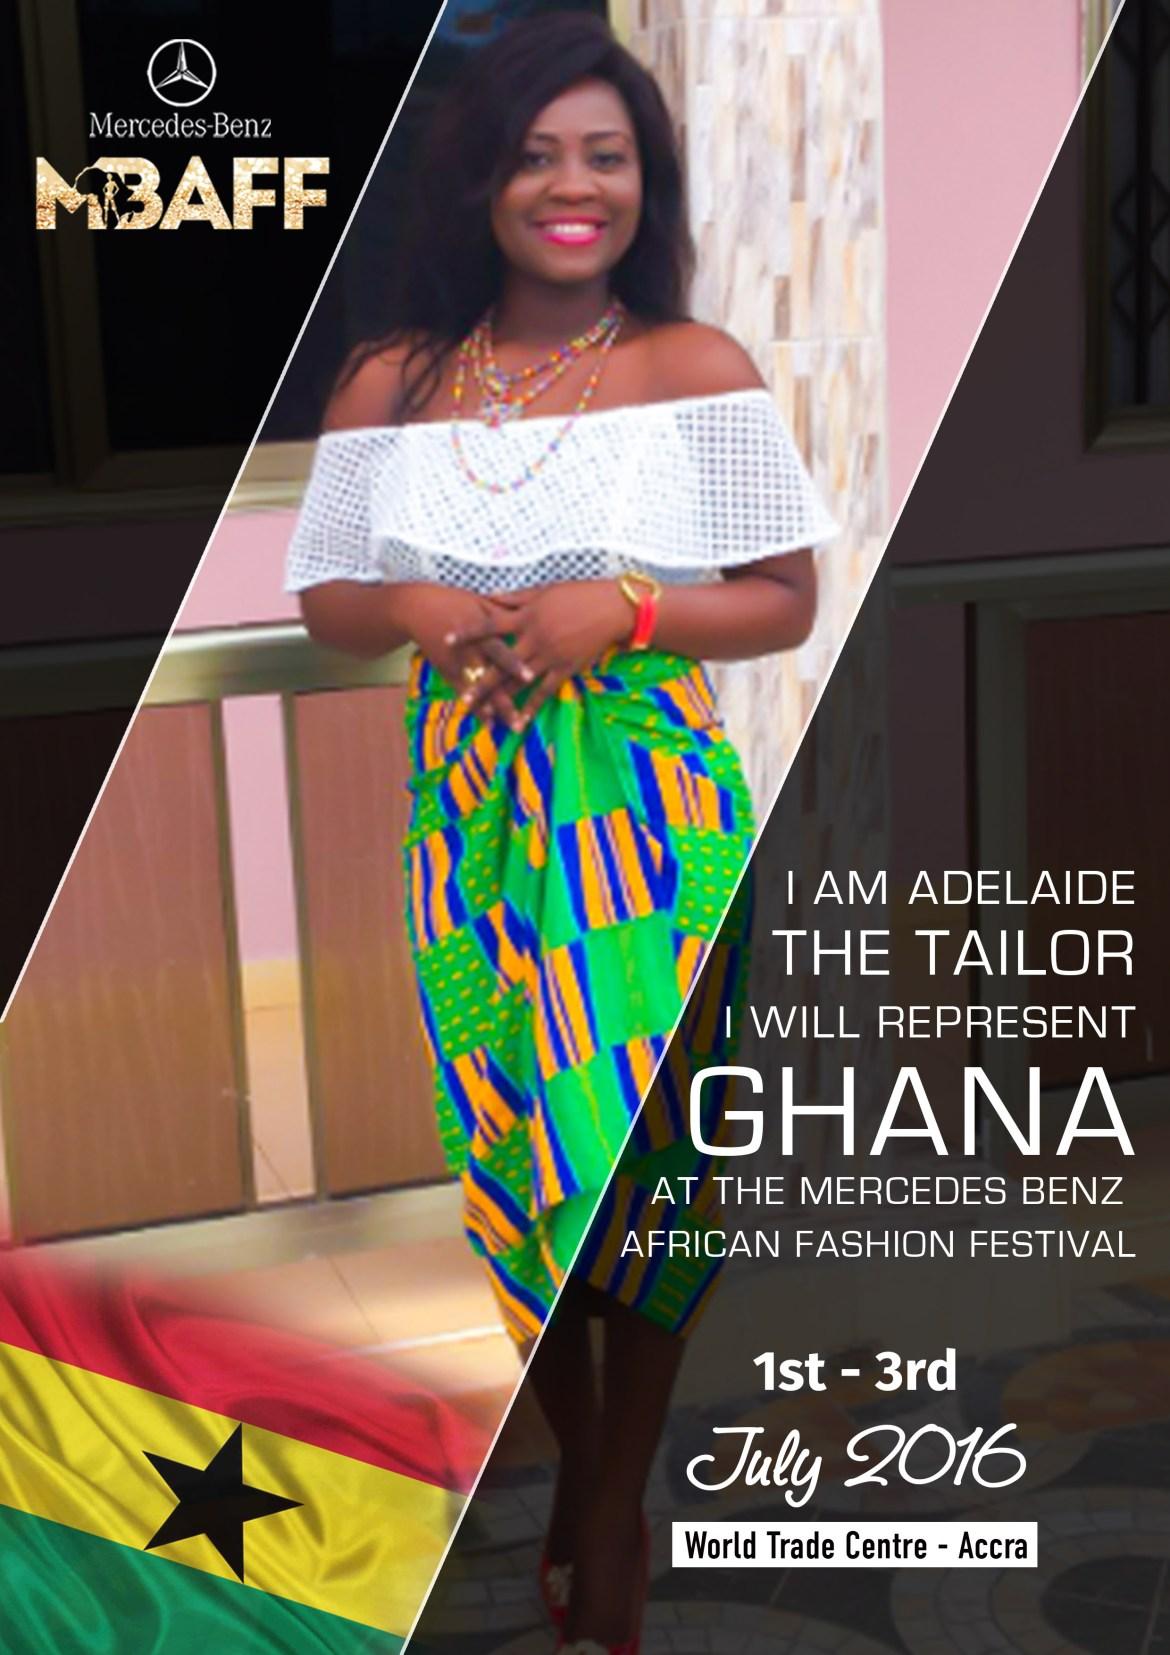 mercedez benz african fashion festival (16)